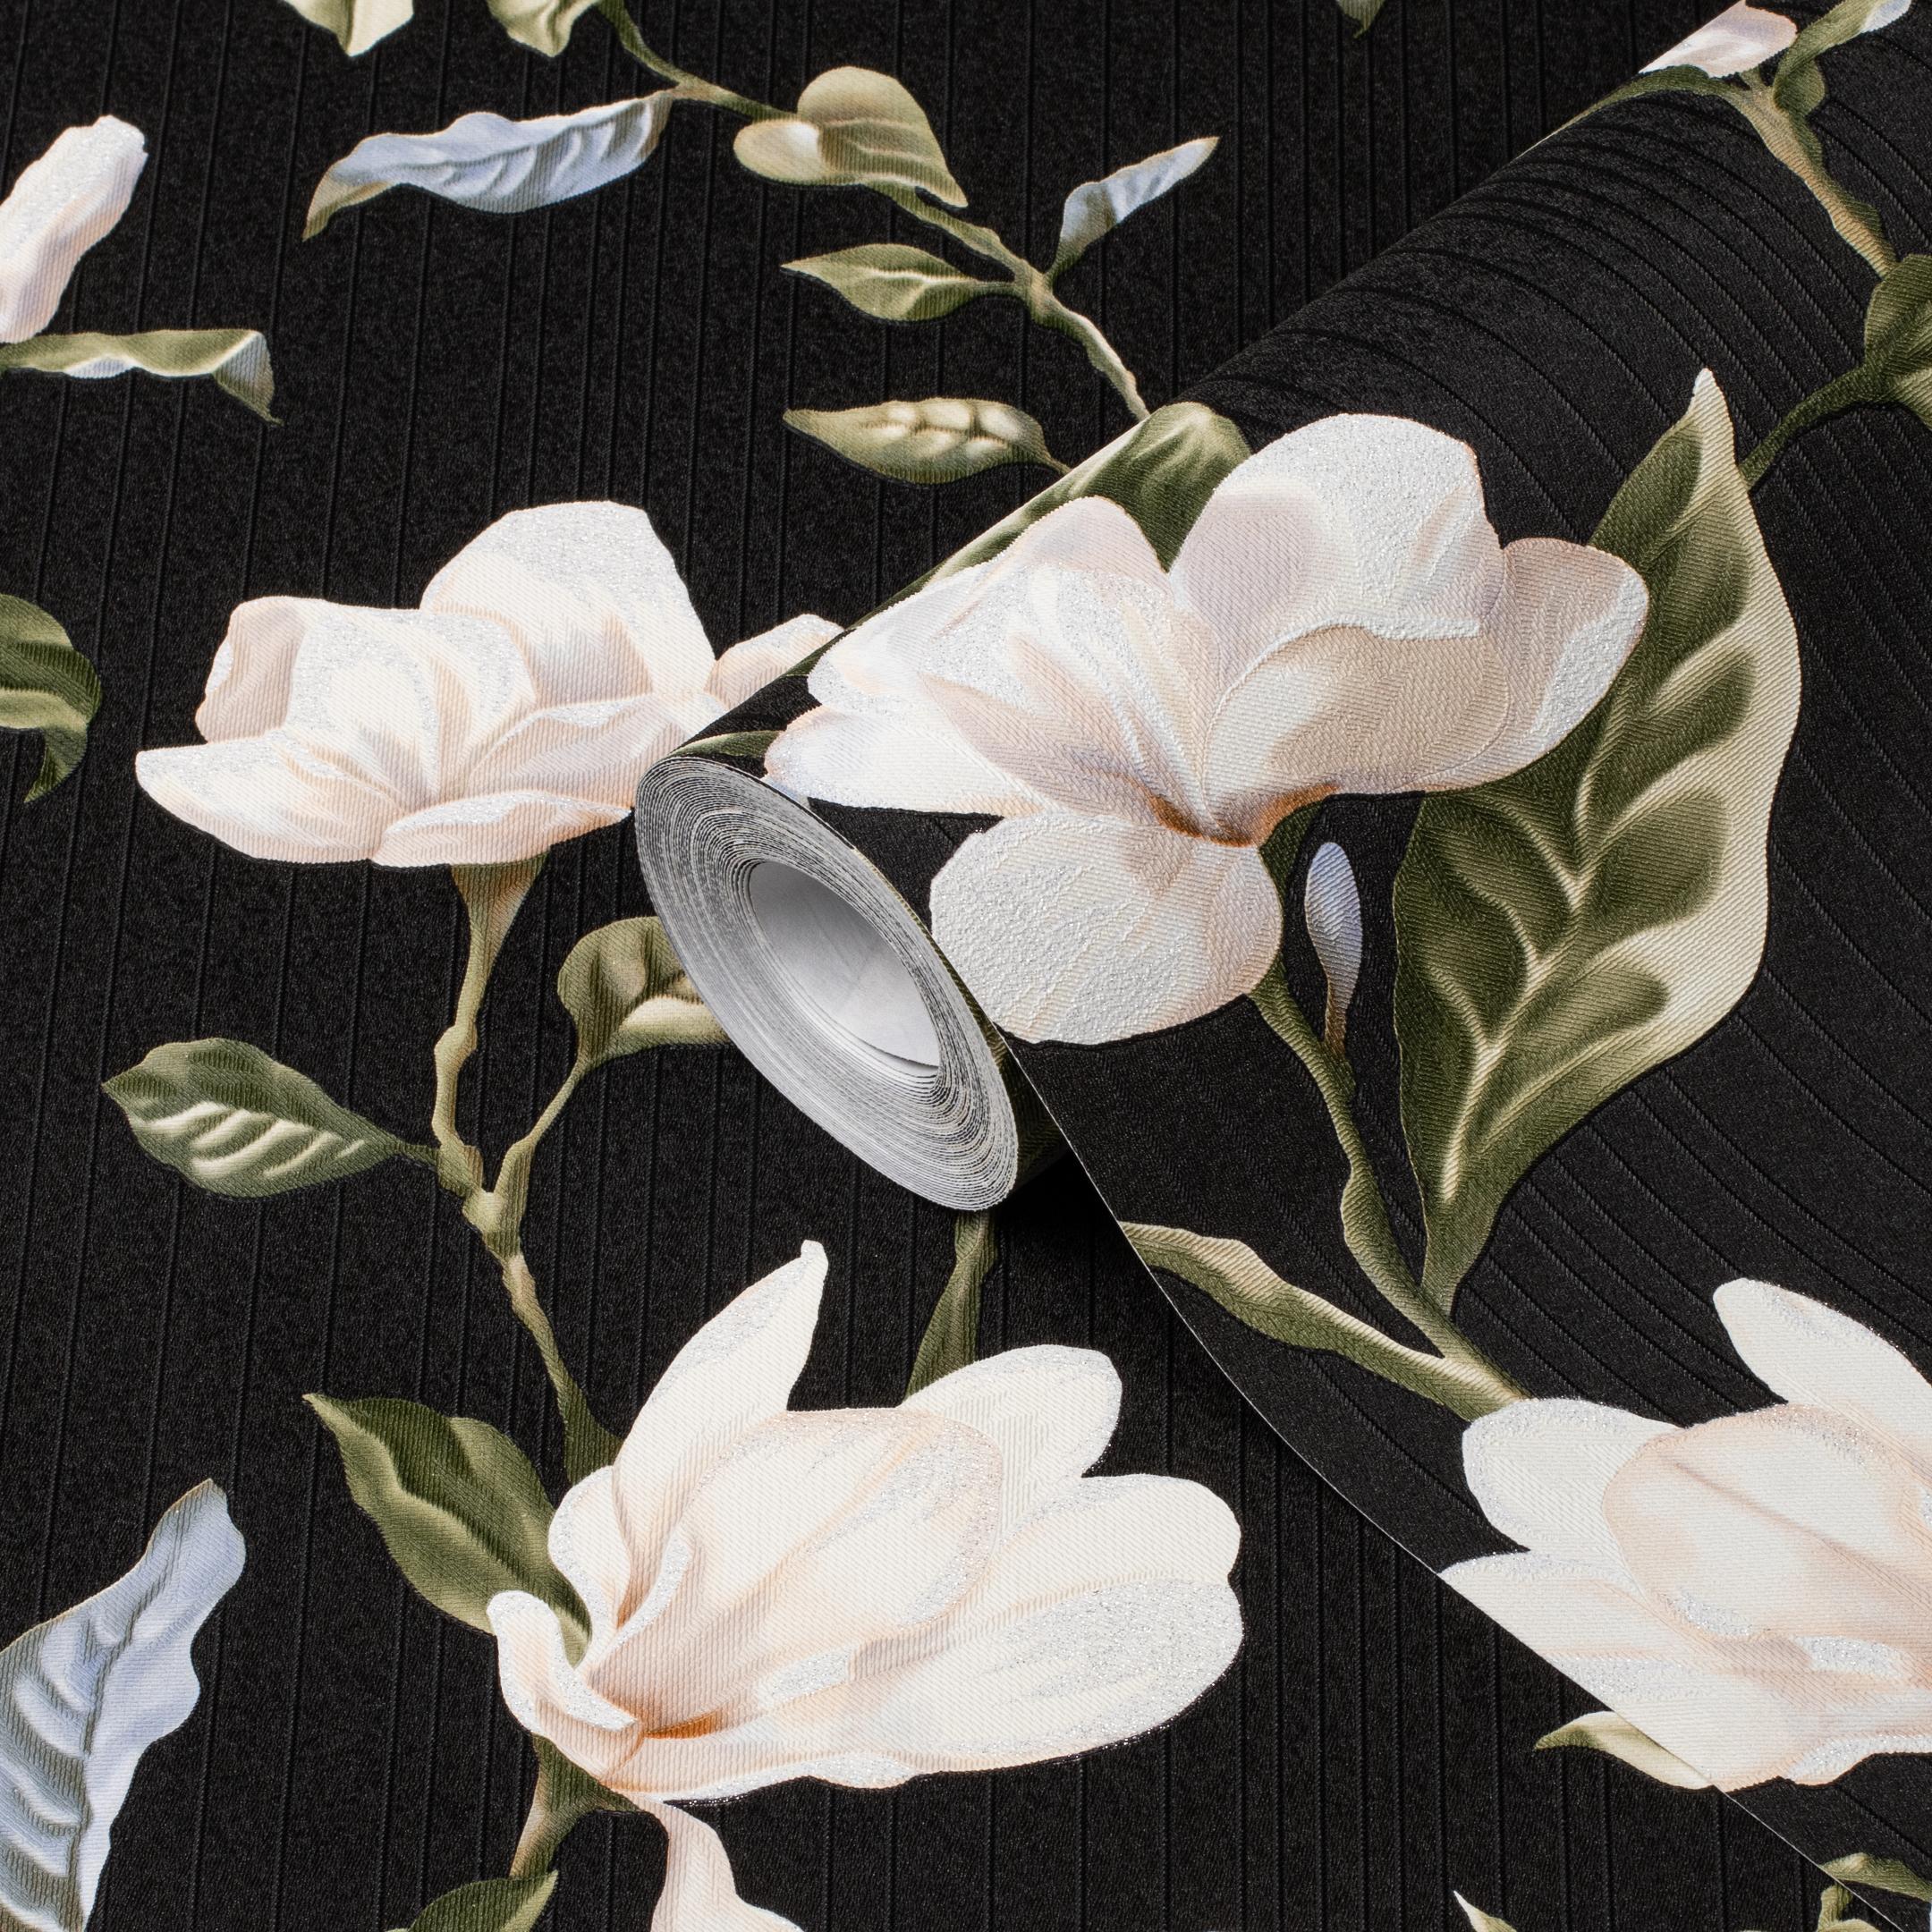 Обои виниловые на флизелиновой основе MaxWall Magnolia 159000-29 (1,06х10 м)